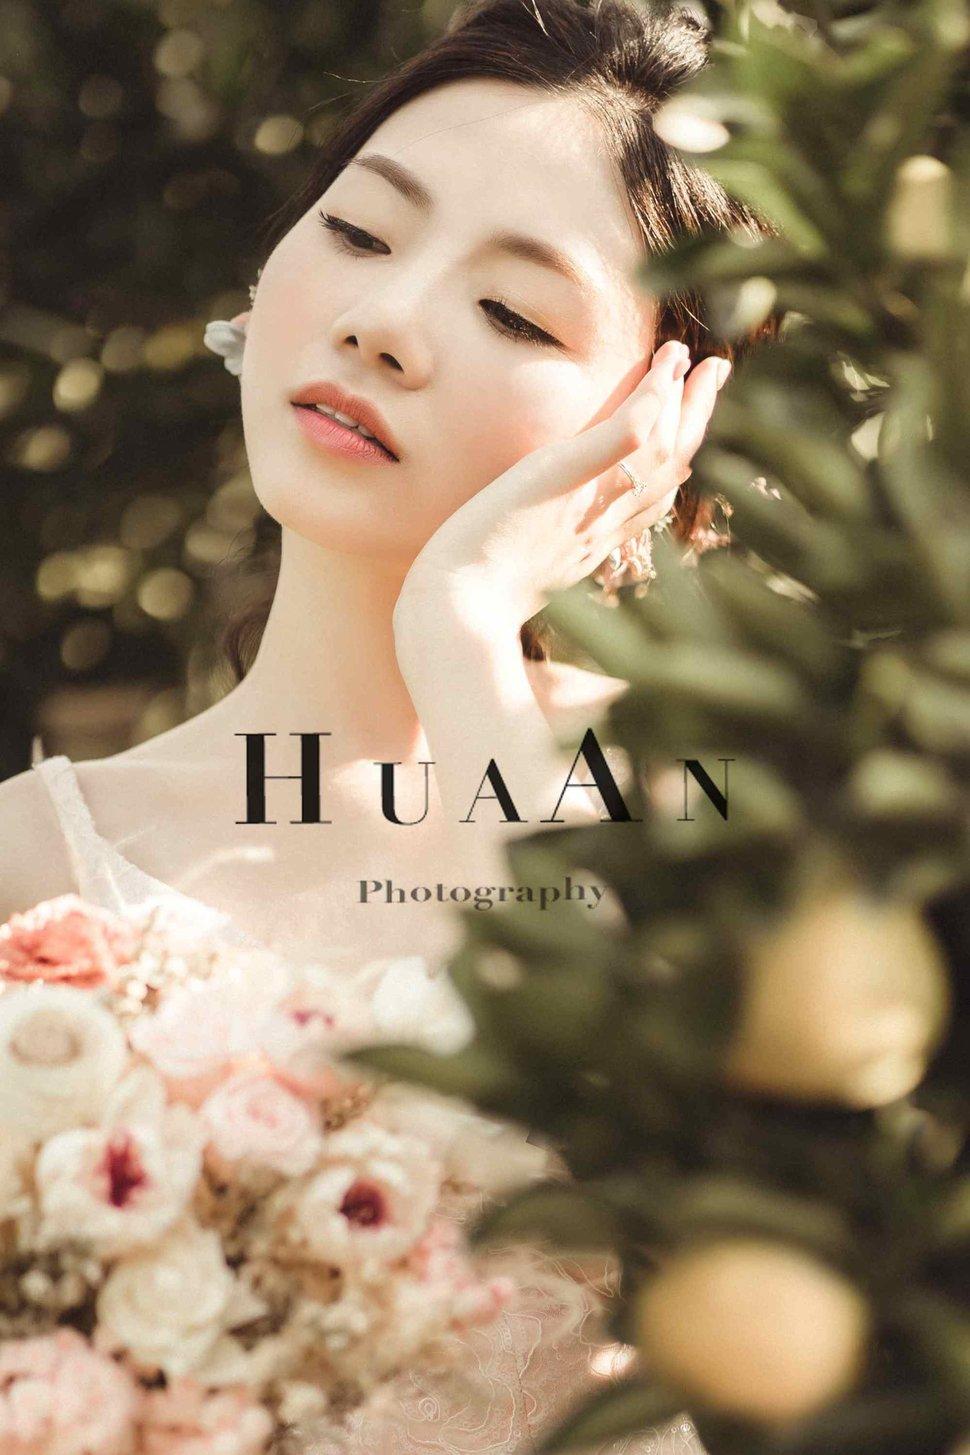 DSC04726-1 - Huaan Photography《結婚吧》